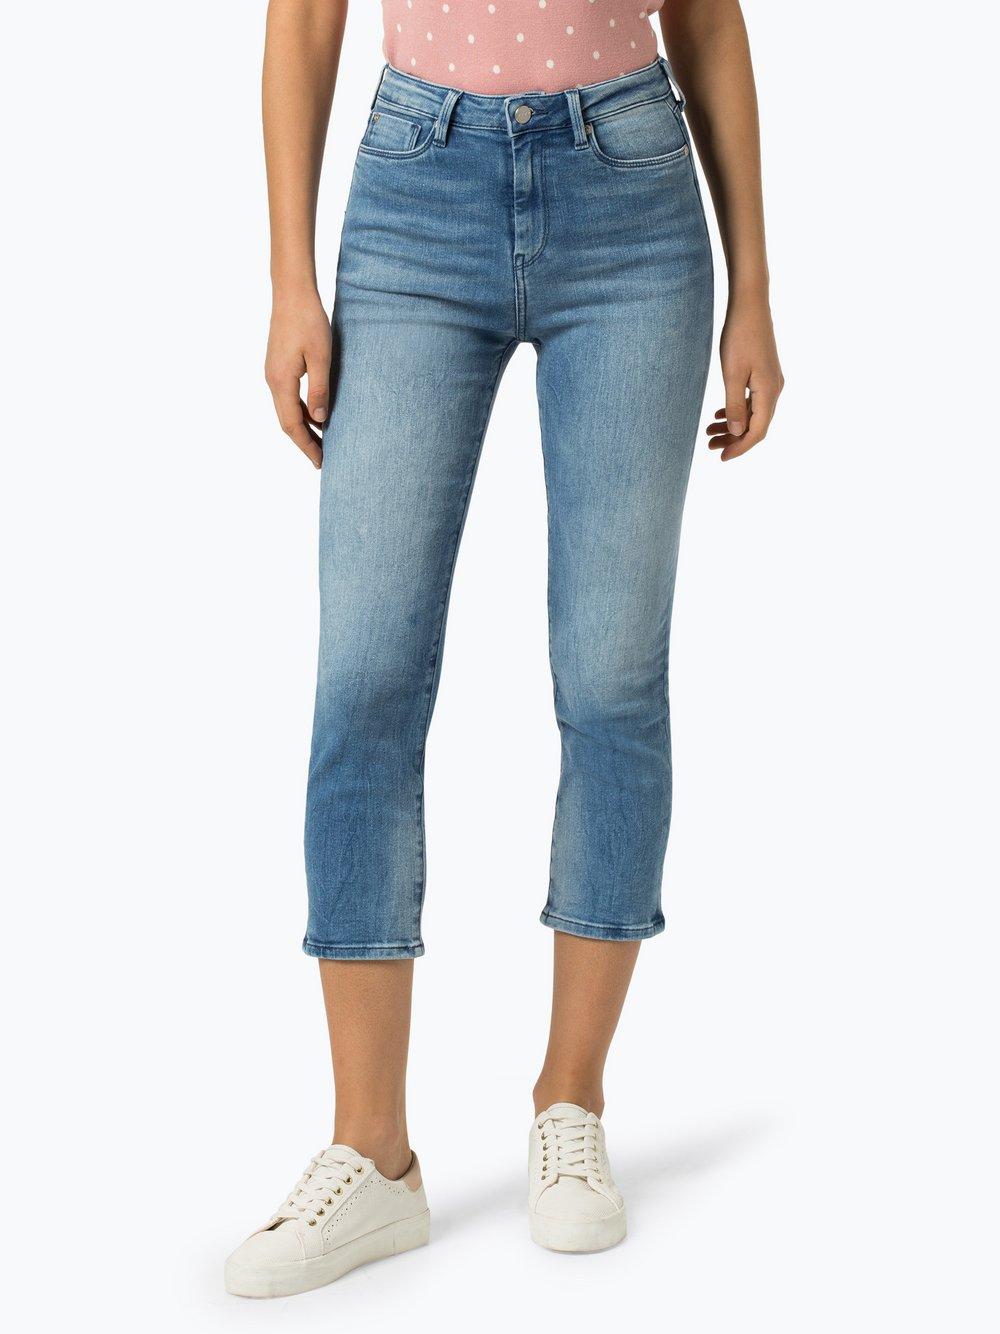 Pepe Jeans - Jeansy damskie – Dion 7/8, niebieski Pepe Jeans